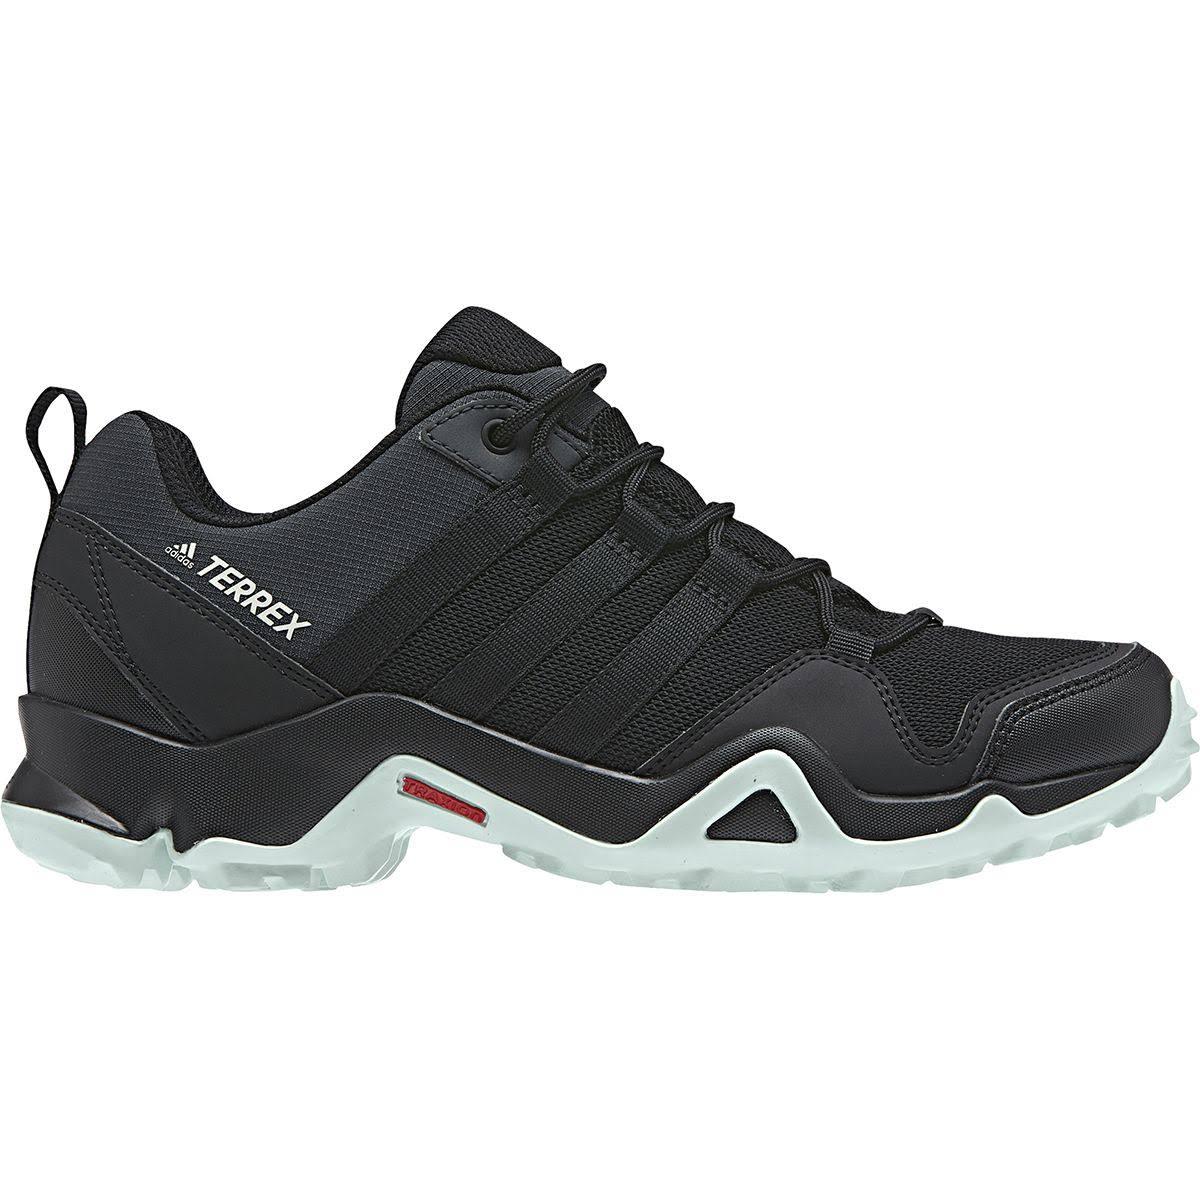 Schwarz Schuhe Damen Ax2r 5 Adidas 7 Terrex Grün Core w7pxvfq